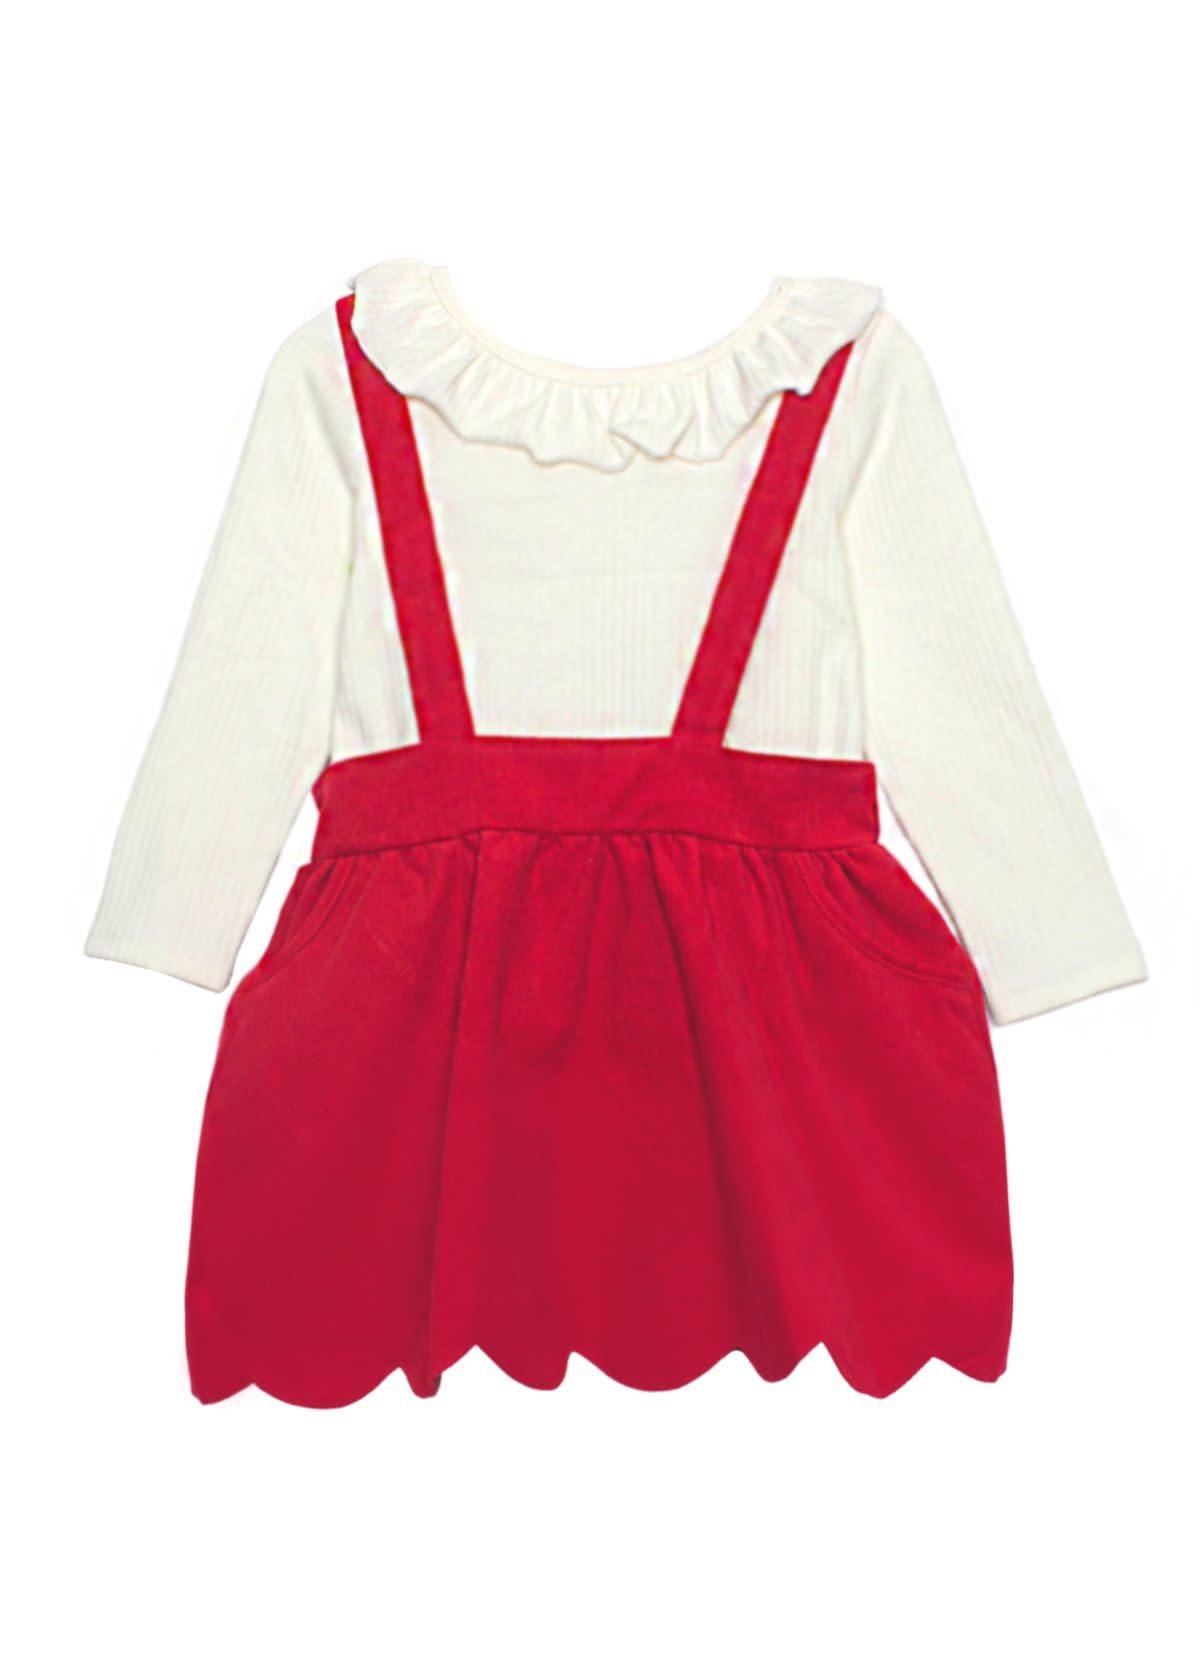 Isobella & Chloe Red Corduroy Skirt Set